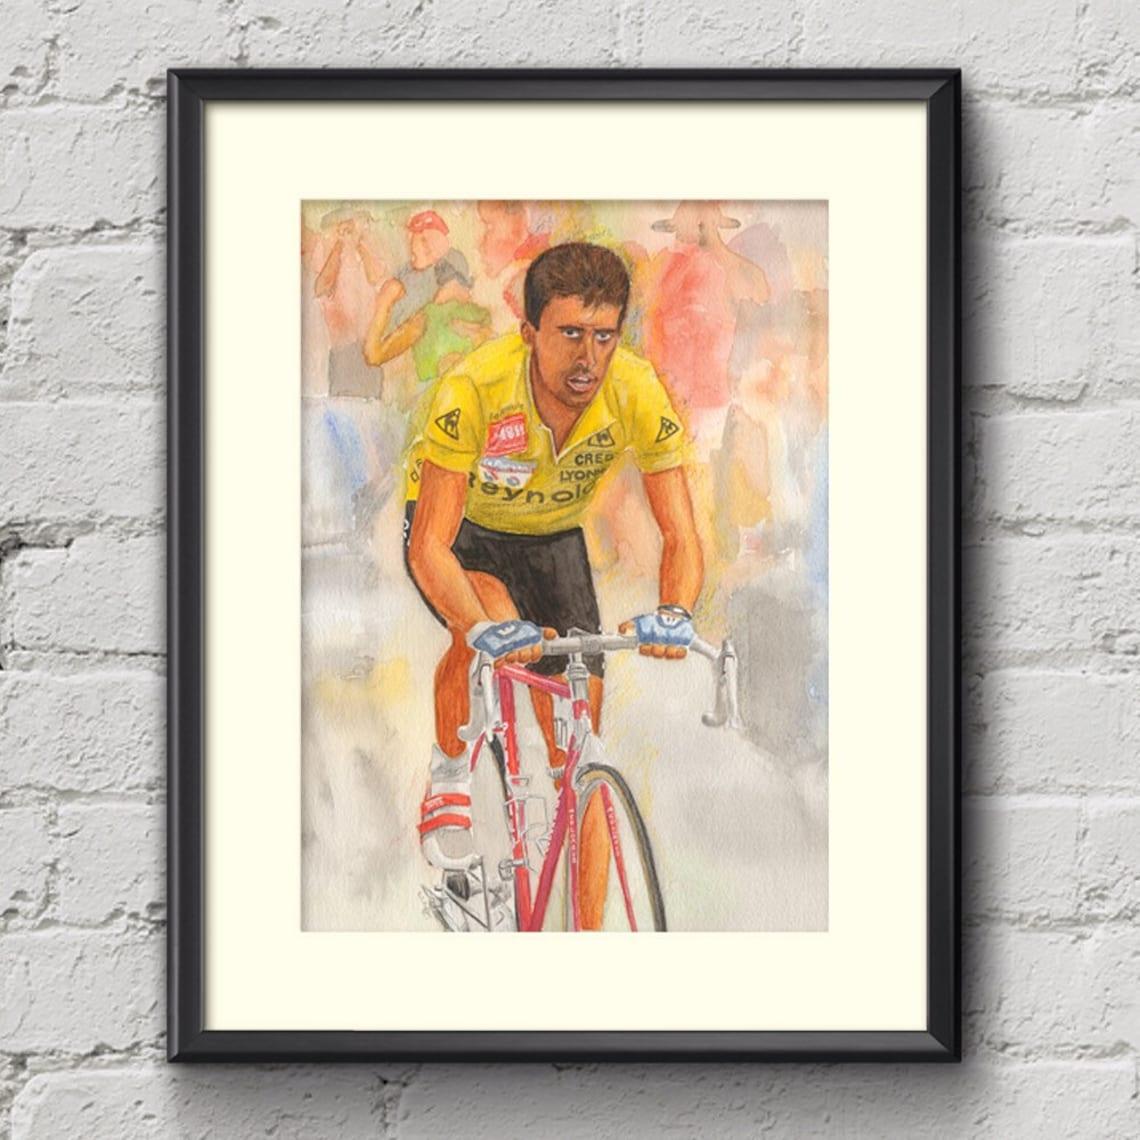 Pedro Delgado Tour de France 1988 Fine Art Cycling Print  4709c7bbd